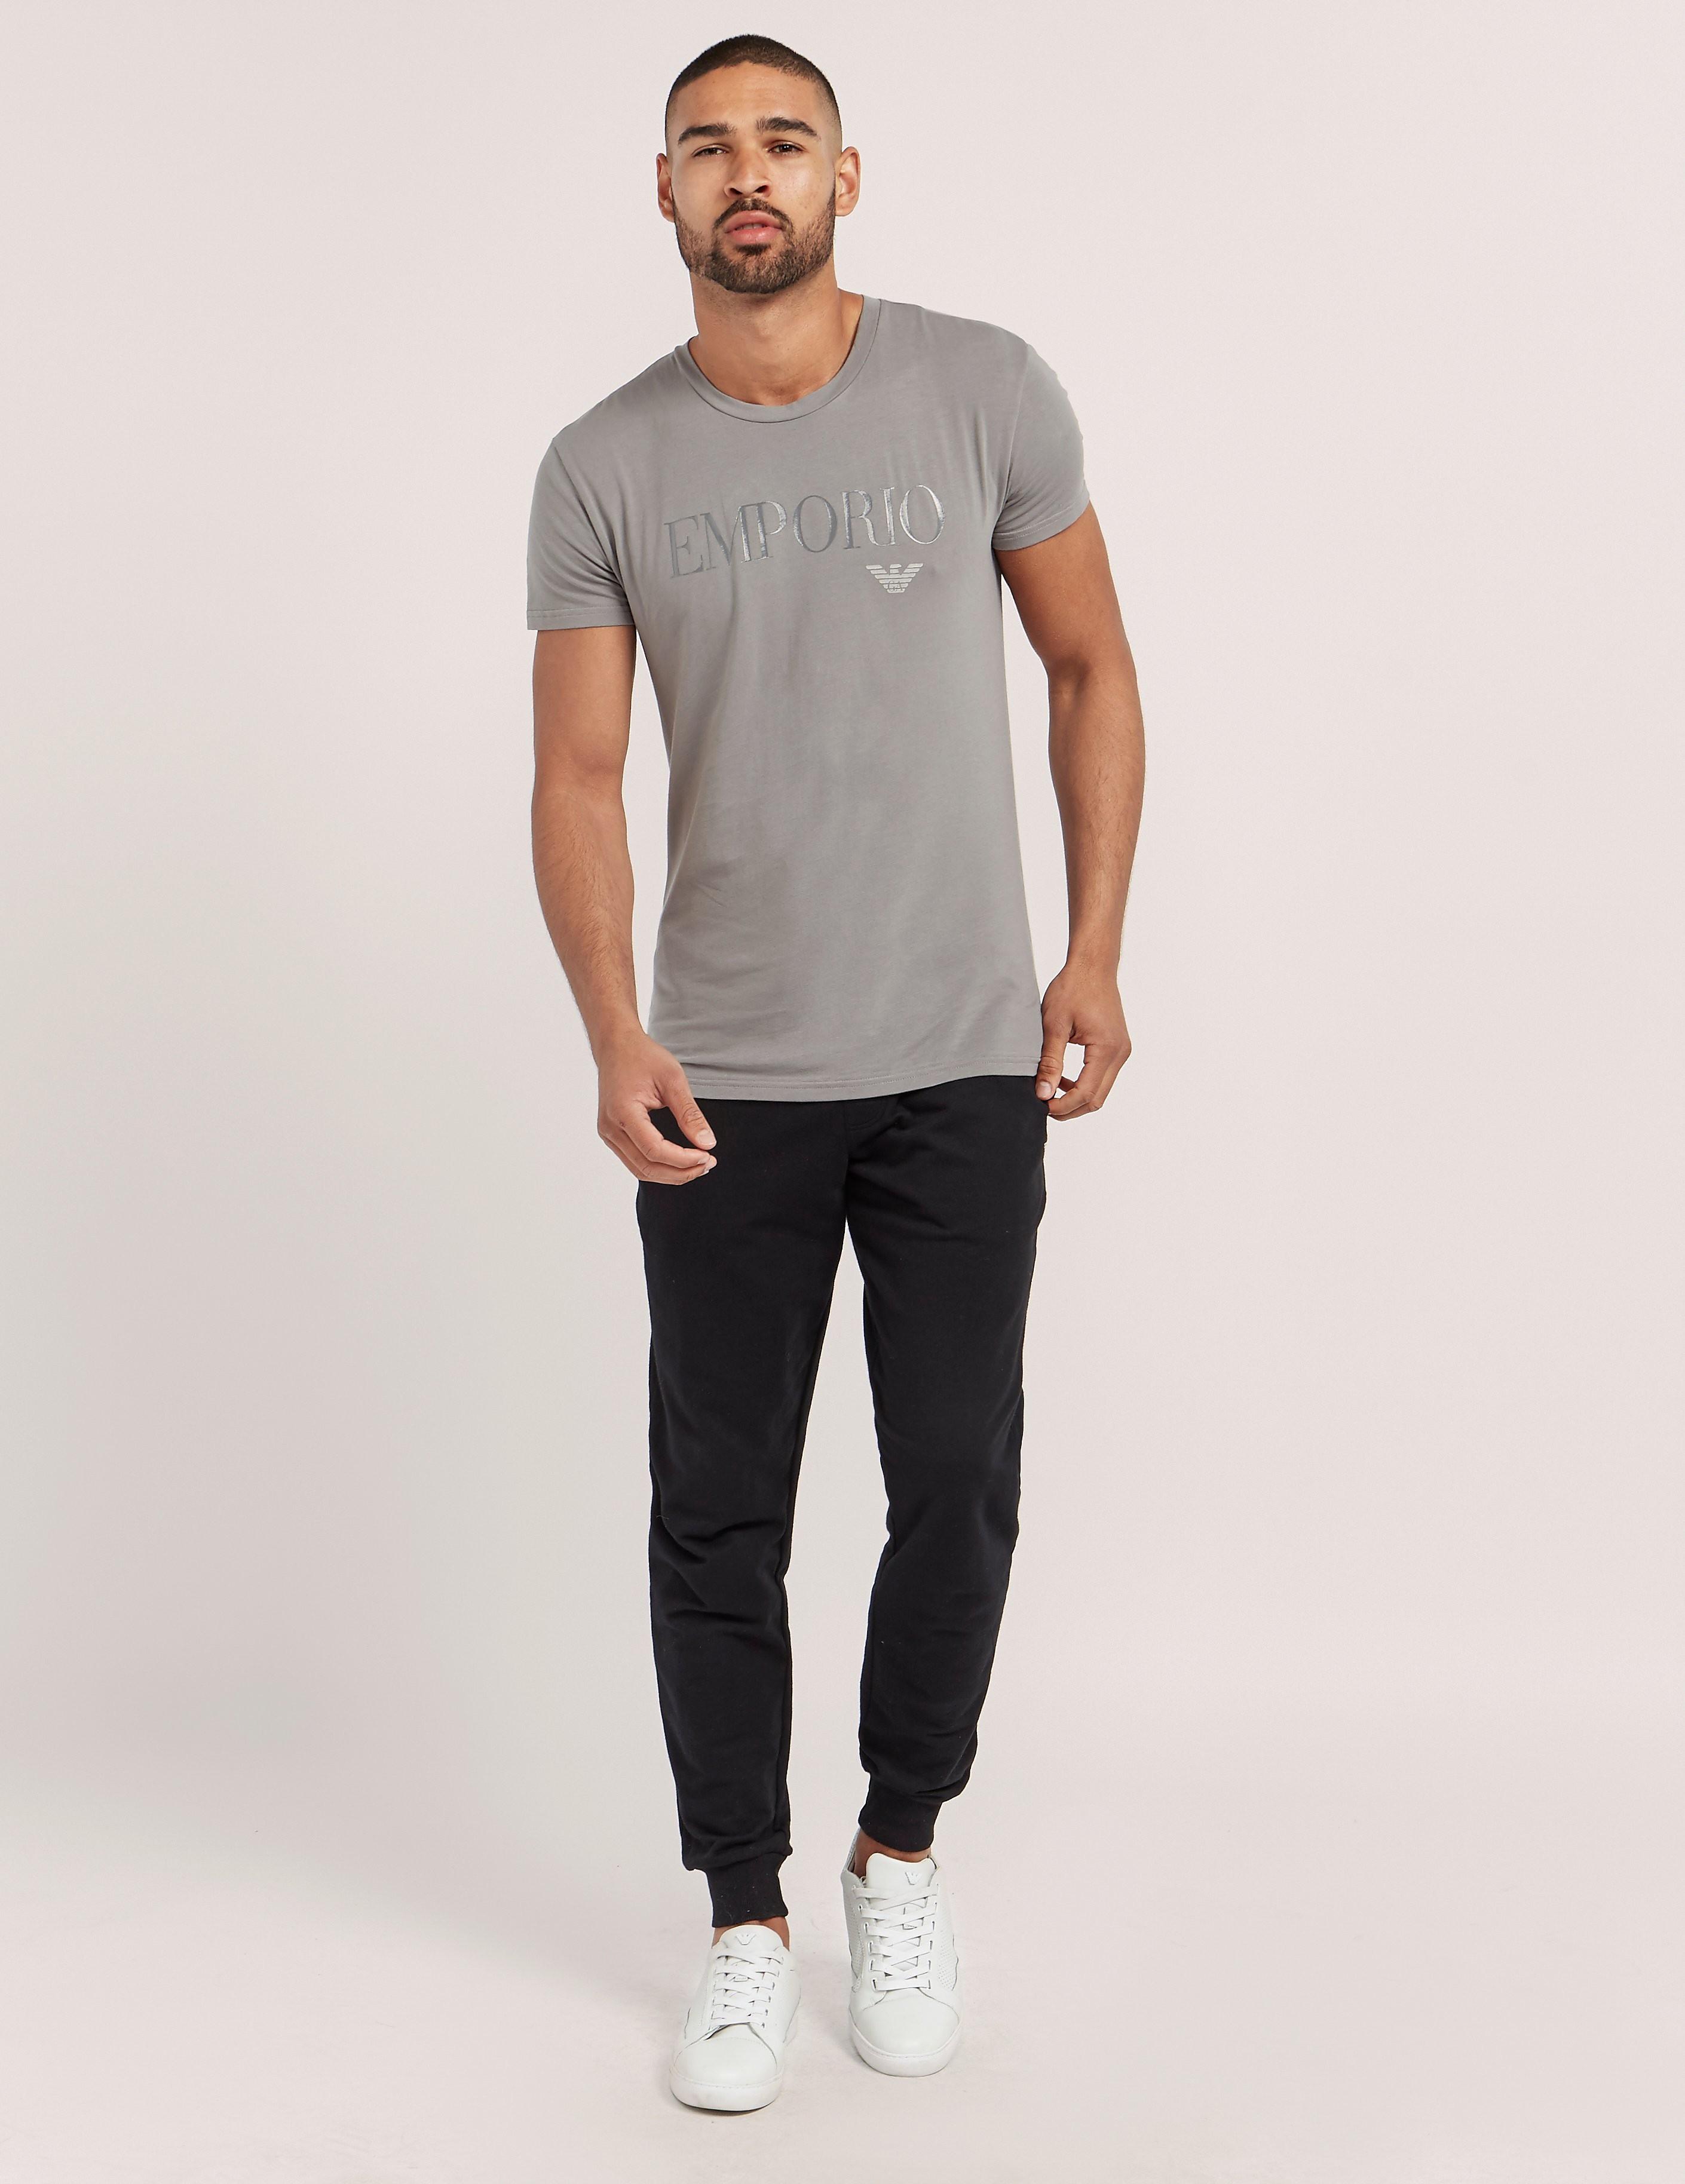 Emporio Armani Gel Print Crew Short Sleeve T-Shirt